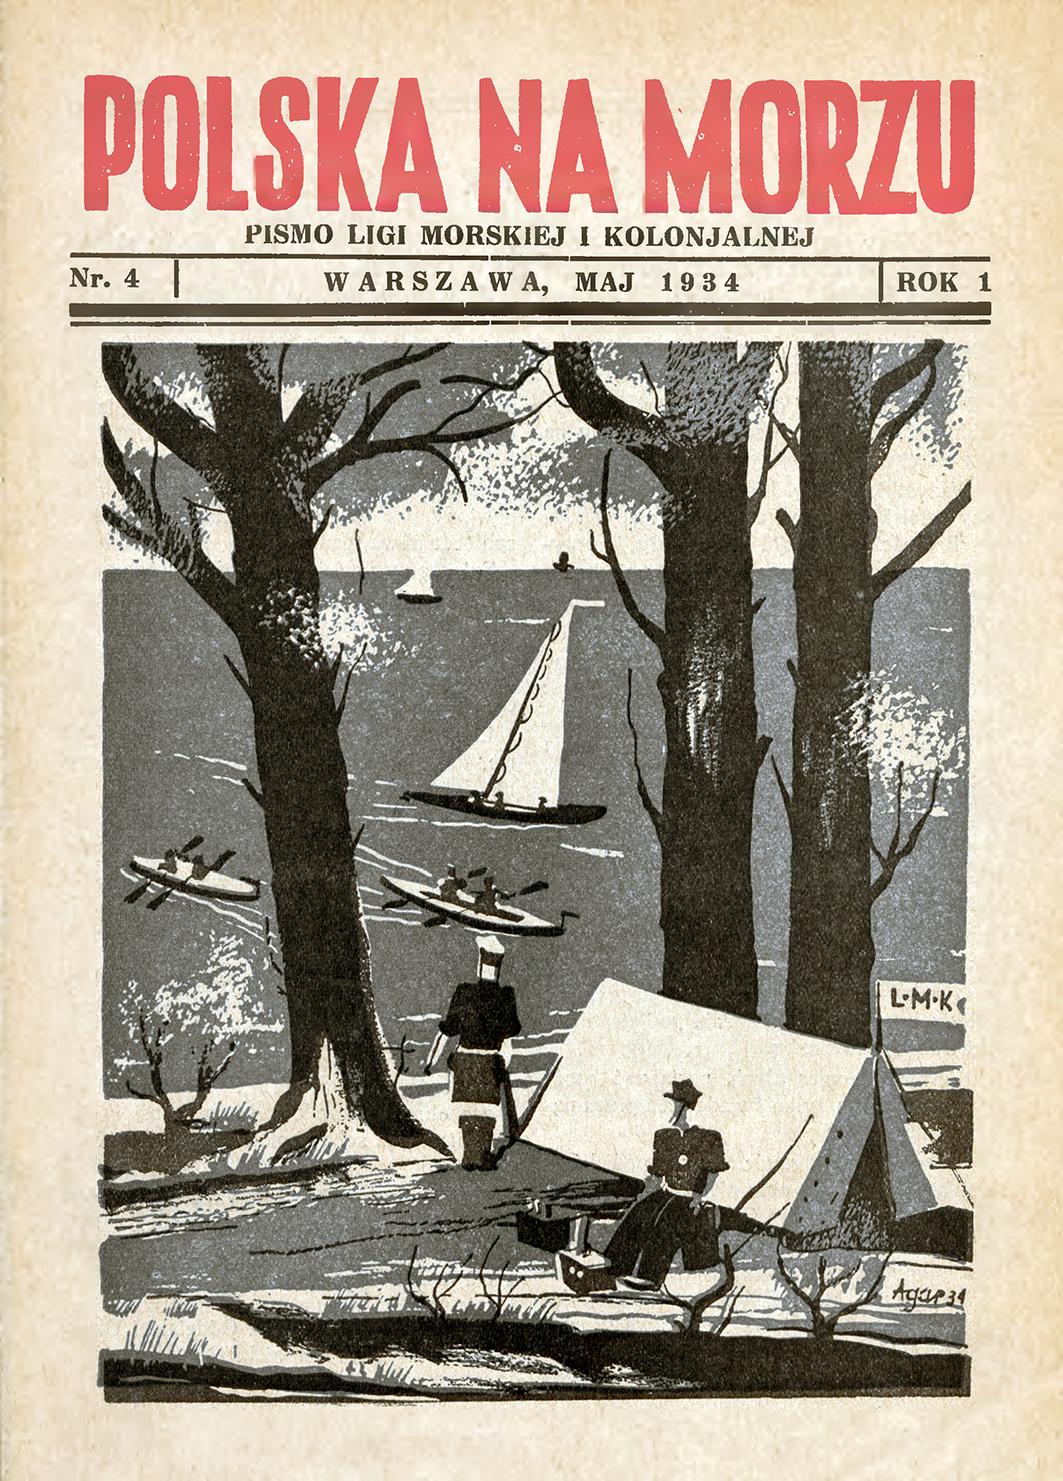 Polska na Morzu : pismo Ligi Morskiej i Kolonjalnej. - Liga Morska i Kolonialna, 1934, nr 4